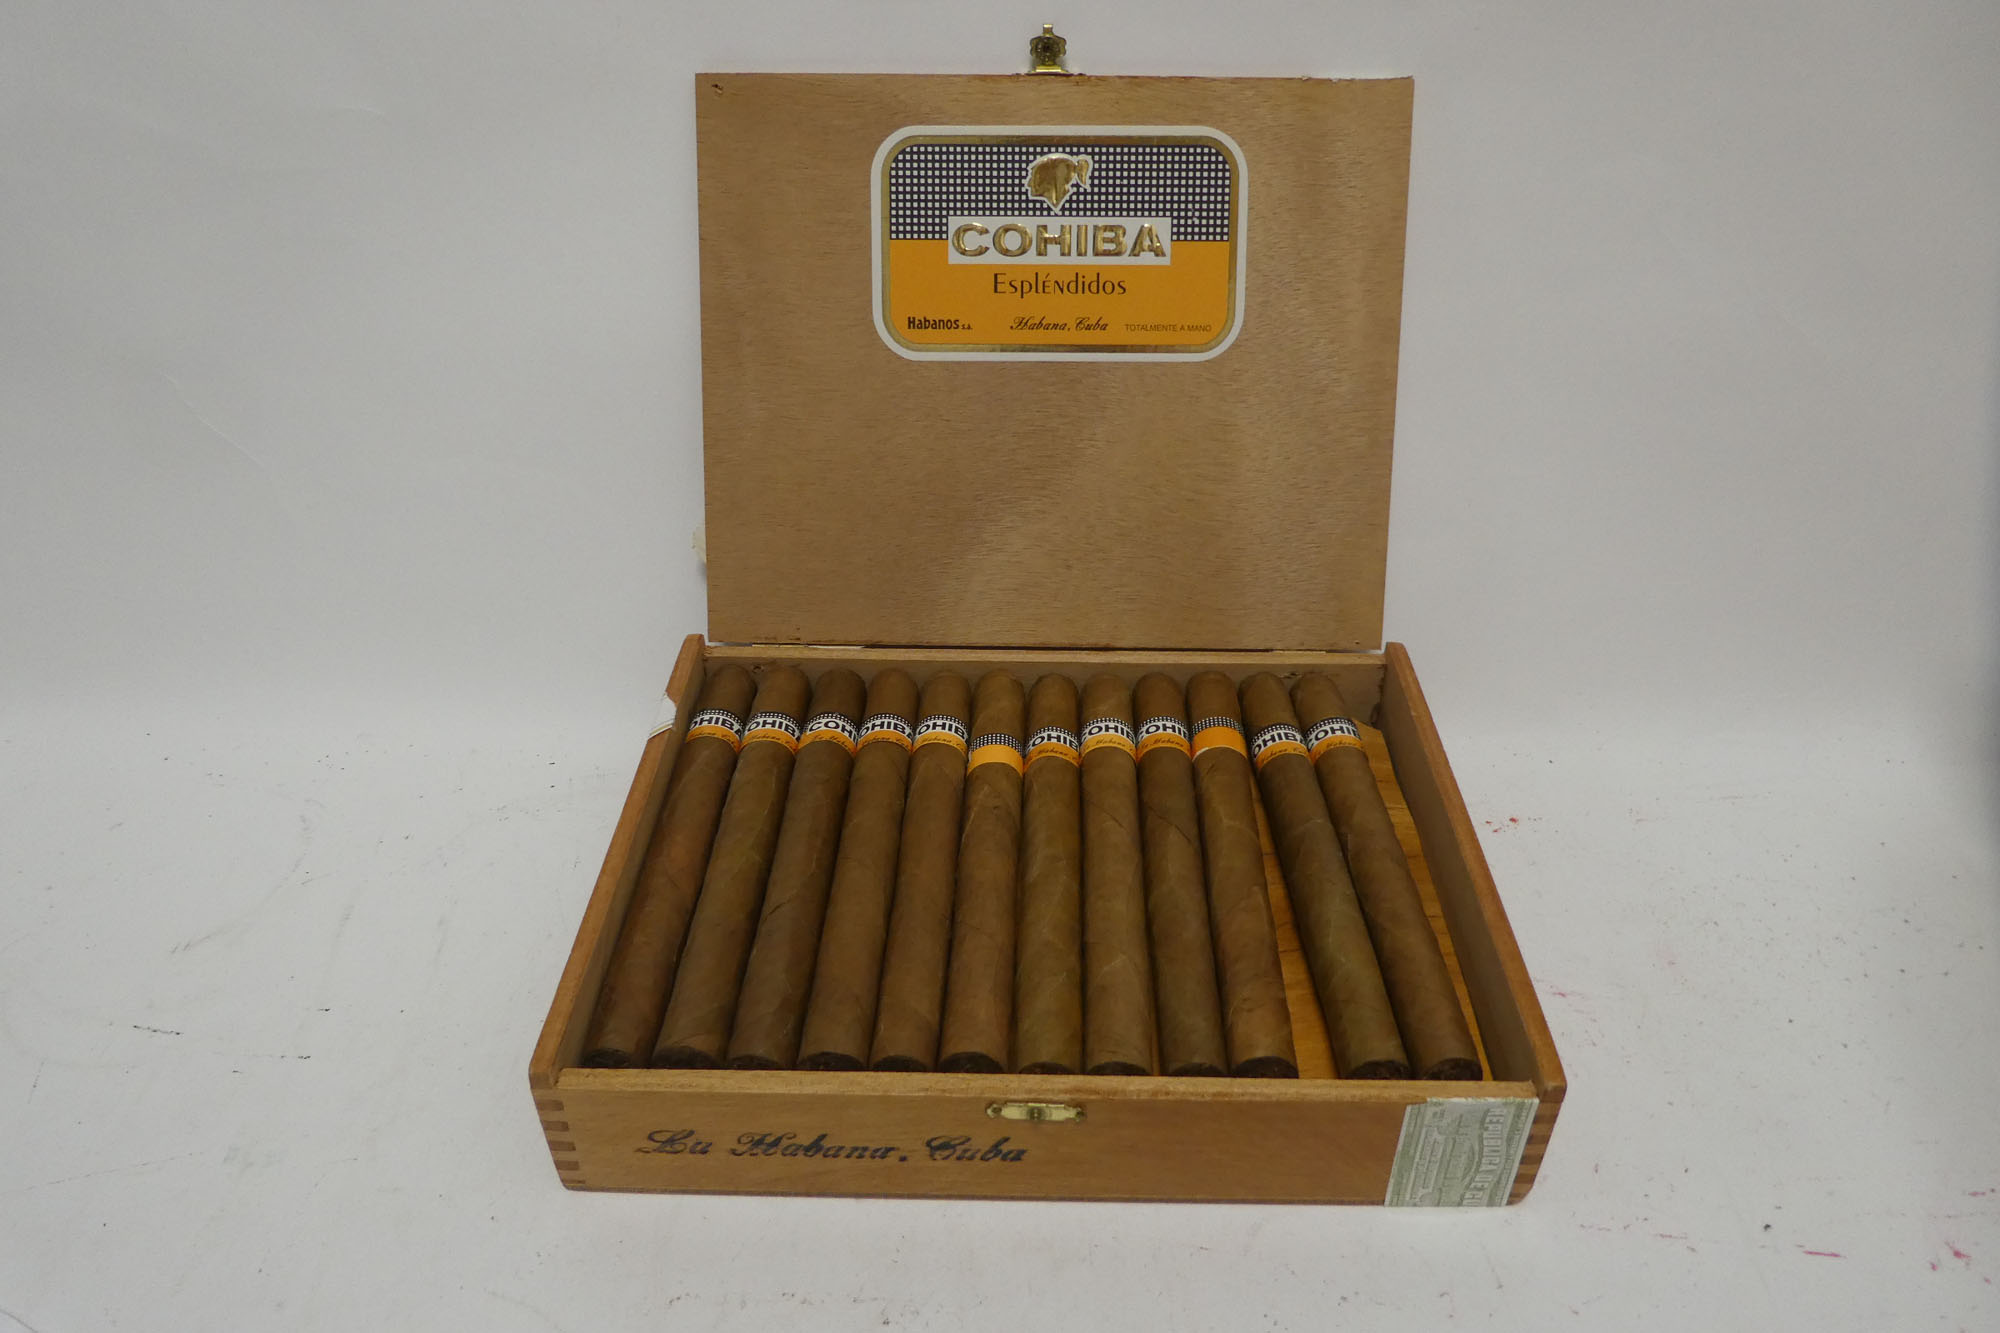 An old box of 24 Esplendidos Cohiba Habanos en Cuba (opened)